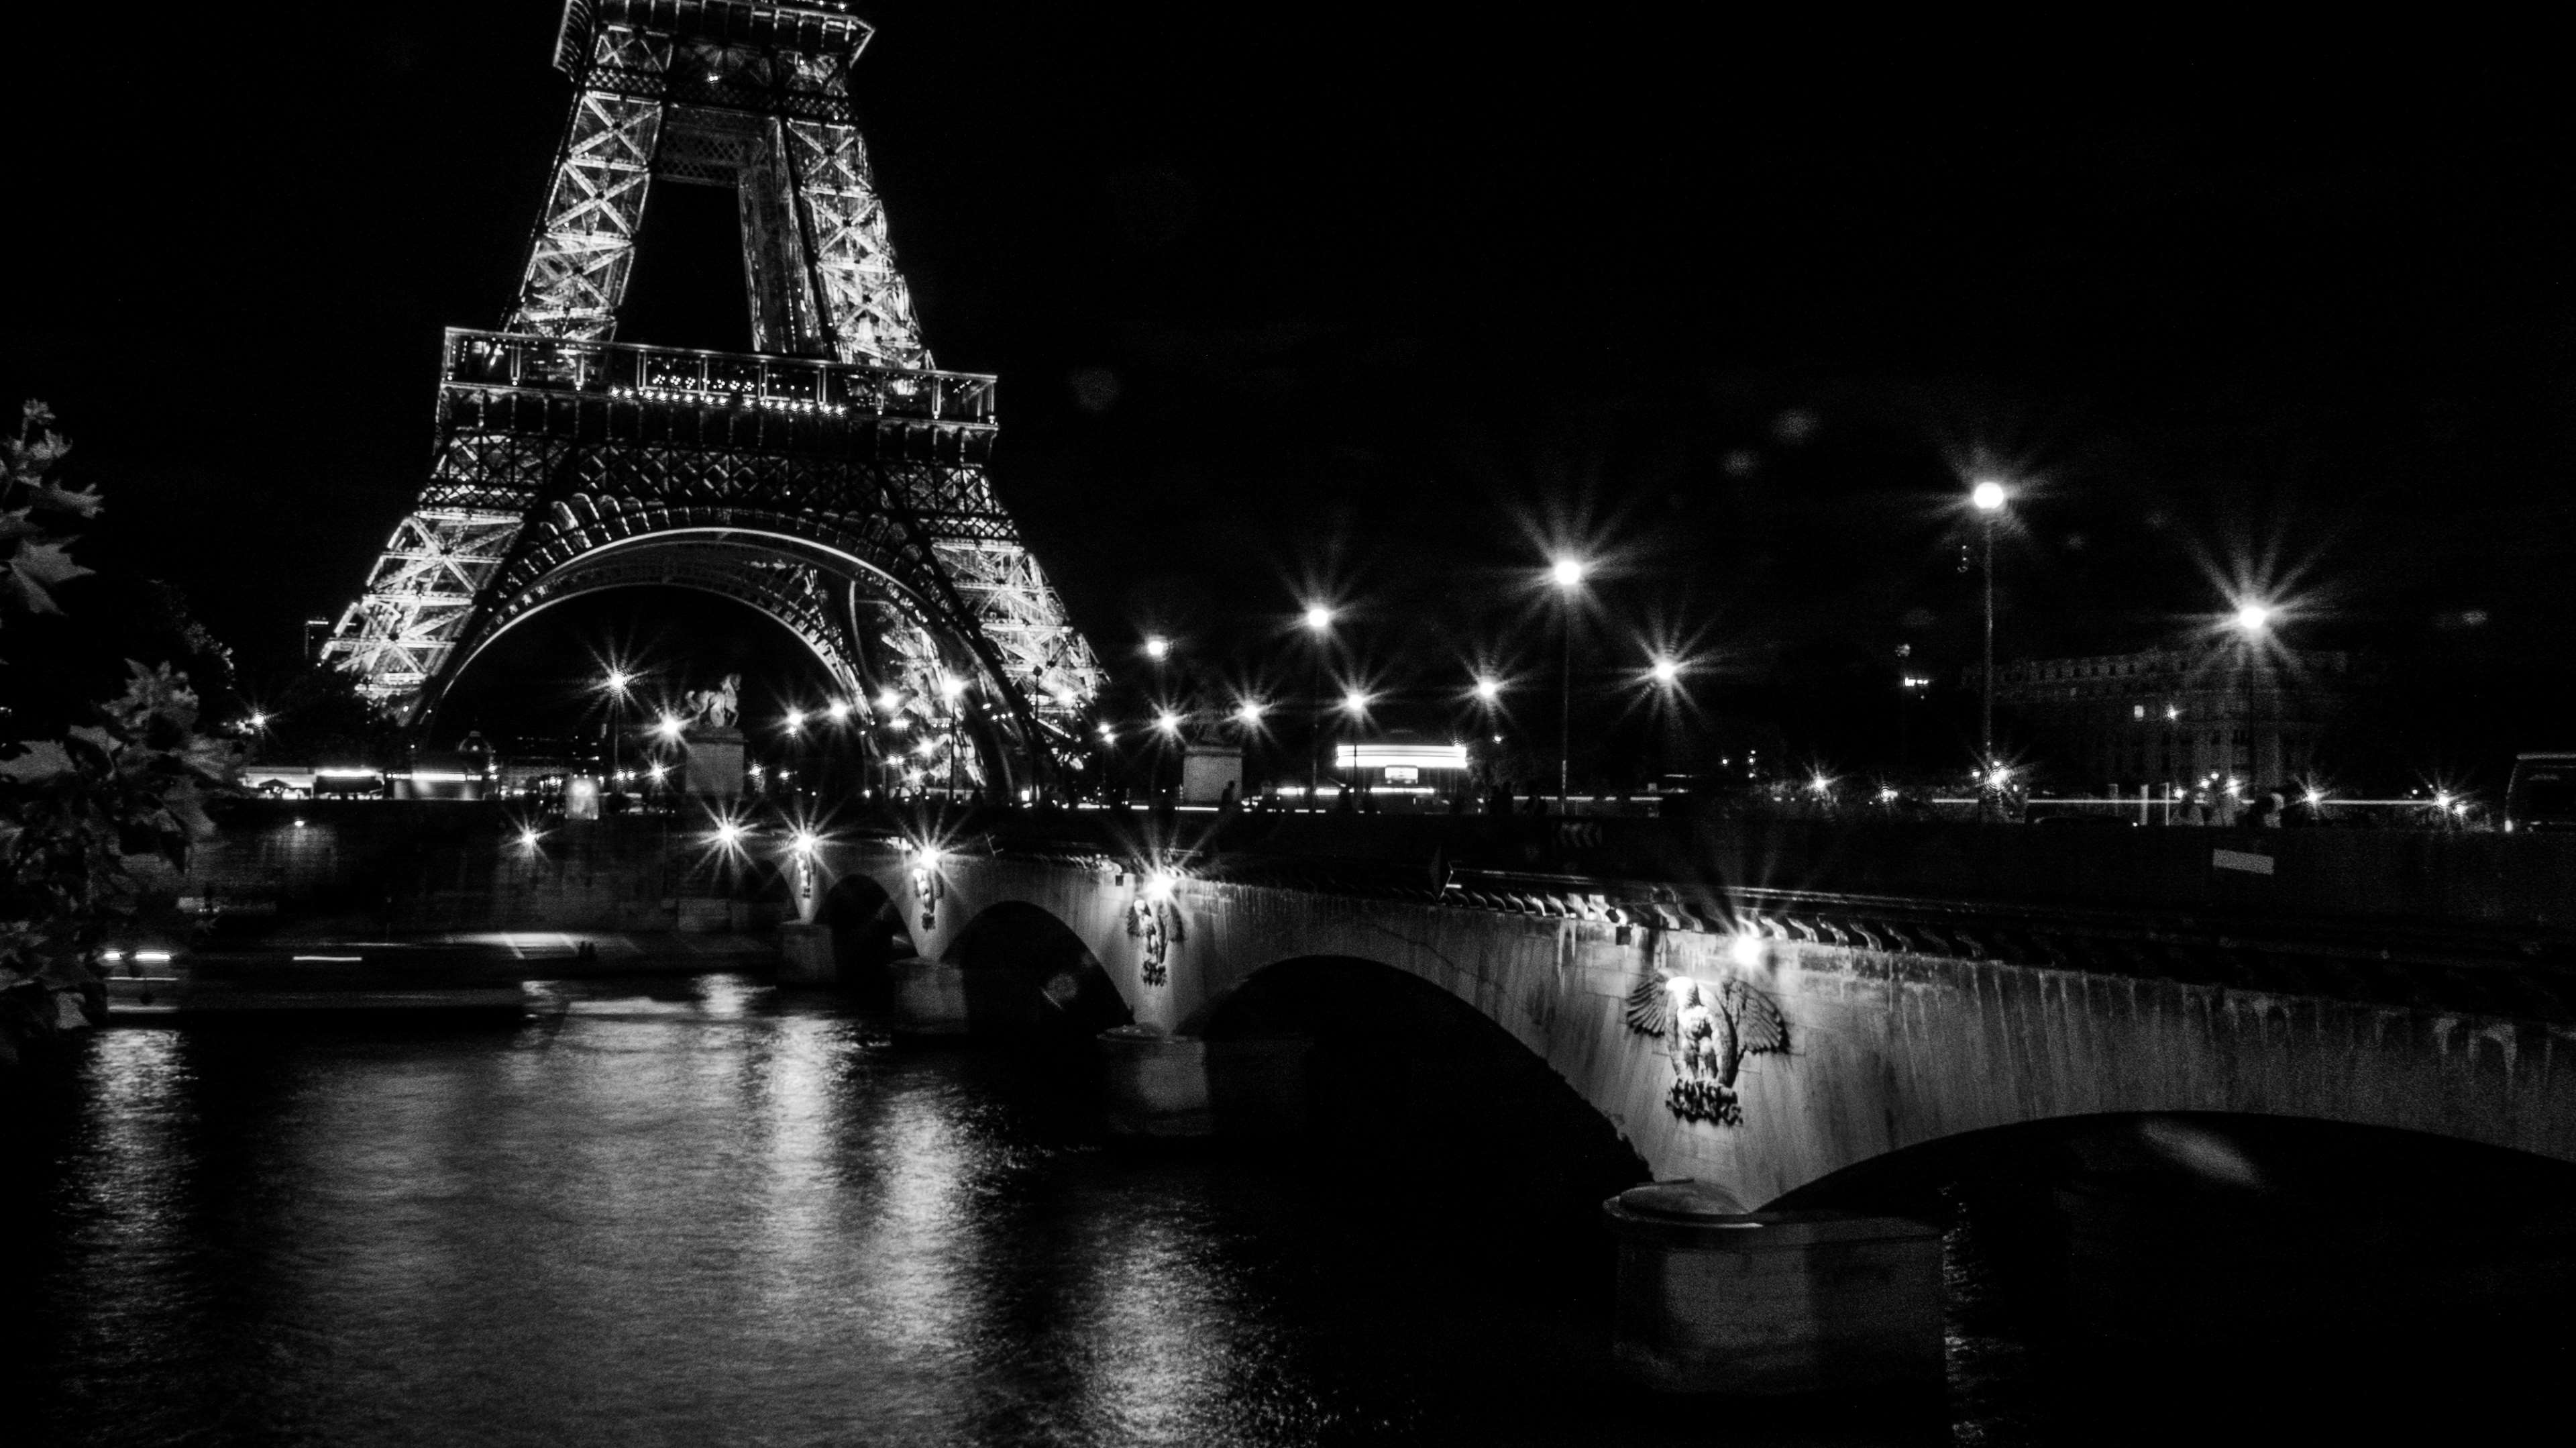 Black And White Bridge Eiffel Tower Lights Long Trocadero Gardens 3840x2158 Download Hd Wallpaper Wallpapertip